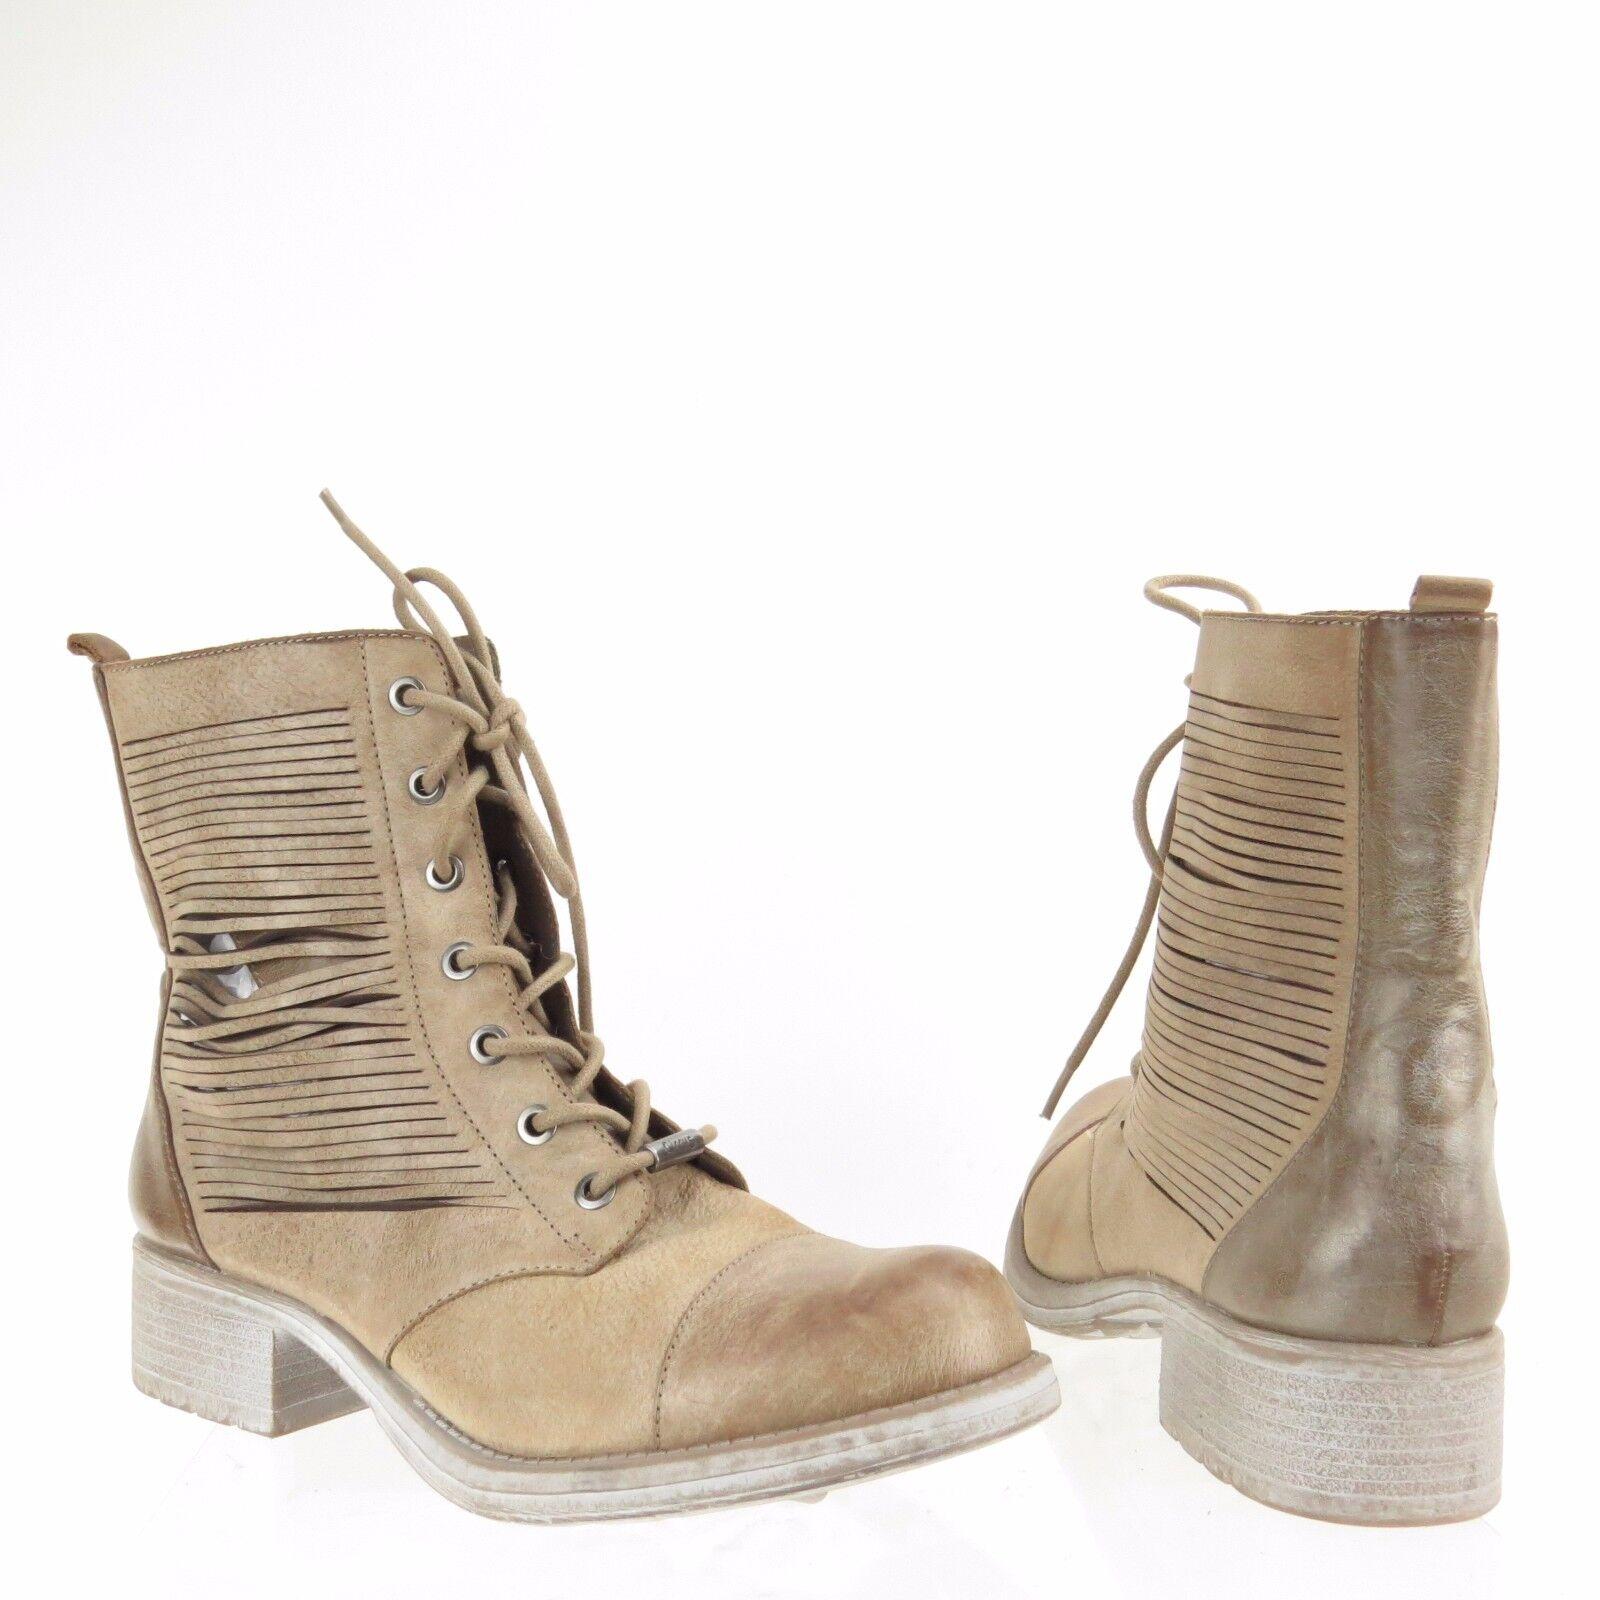 Women's Circus Sam Edelman Gatson shoes Beige Leather Cut Out Boots Sz 9.5 M NEW